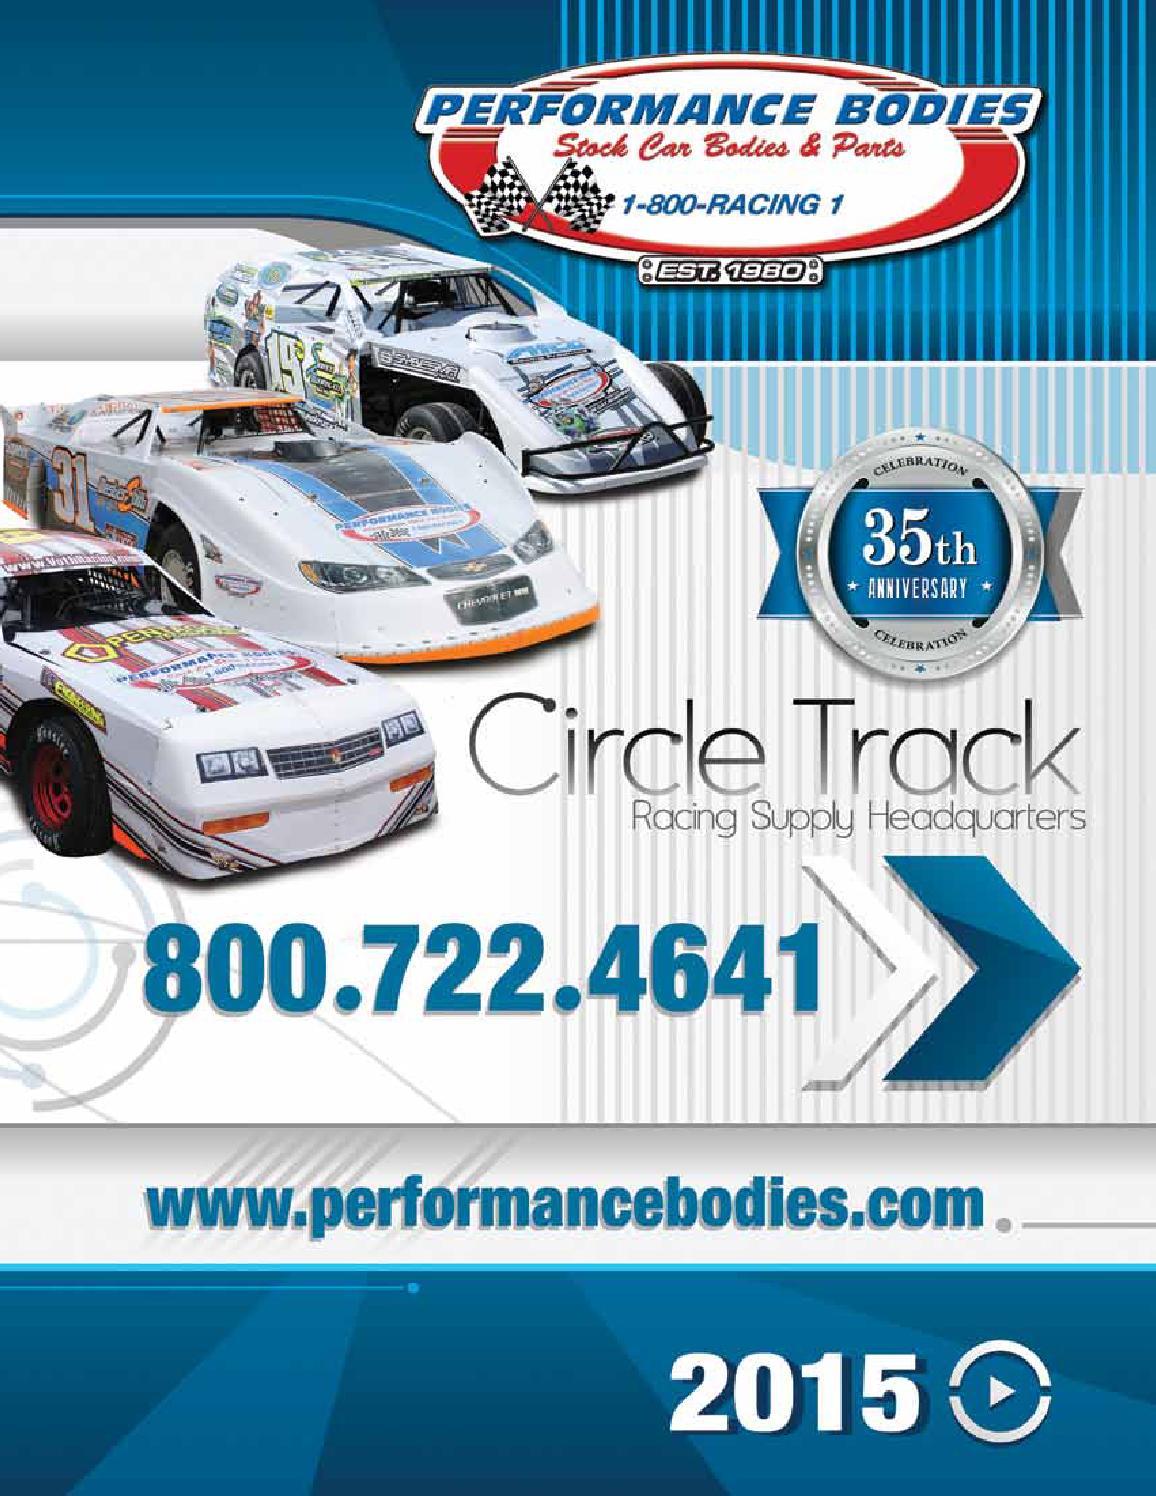 2015 Performance Bodies Retail Catalog by Julie Knutson - issuu